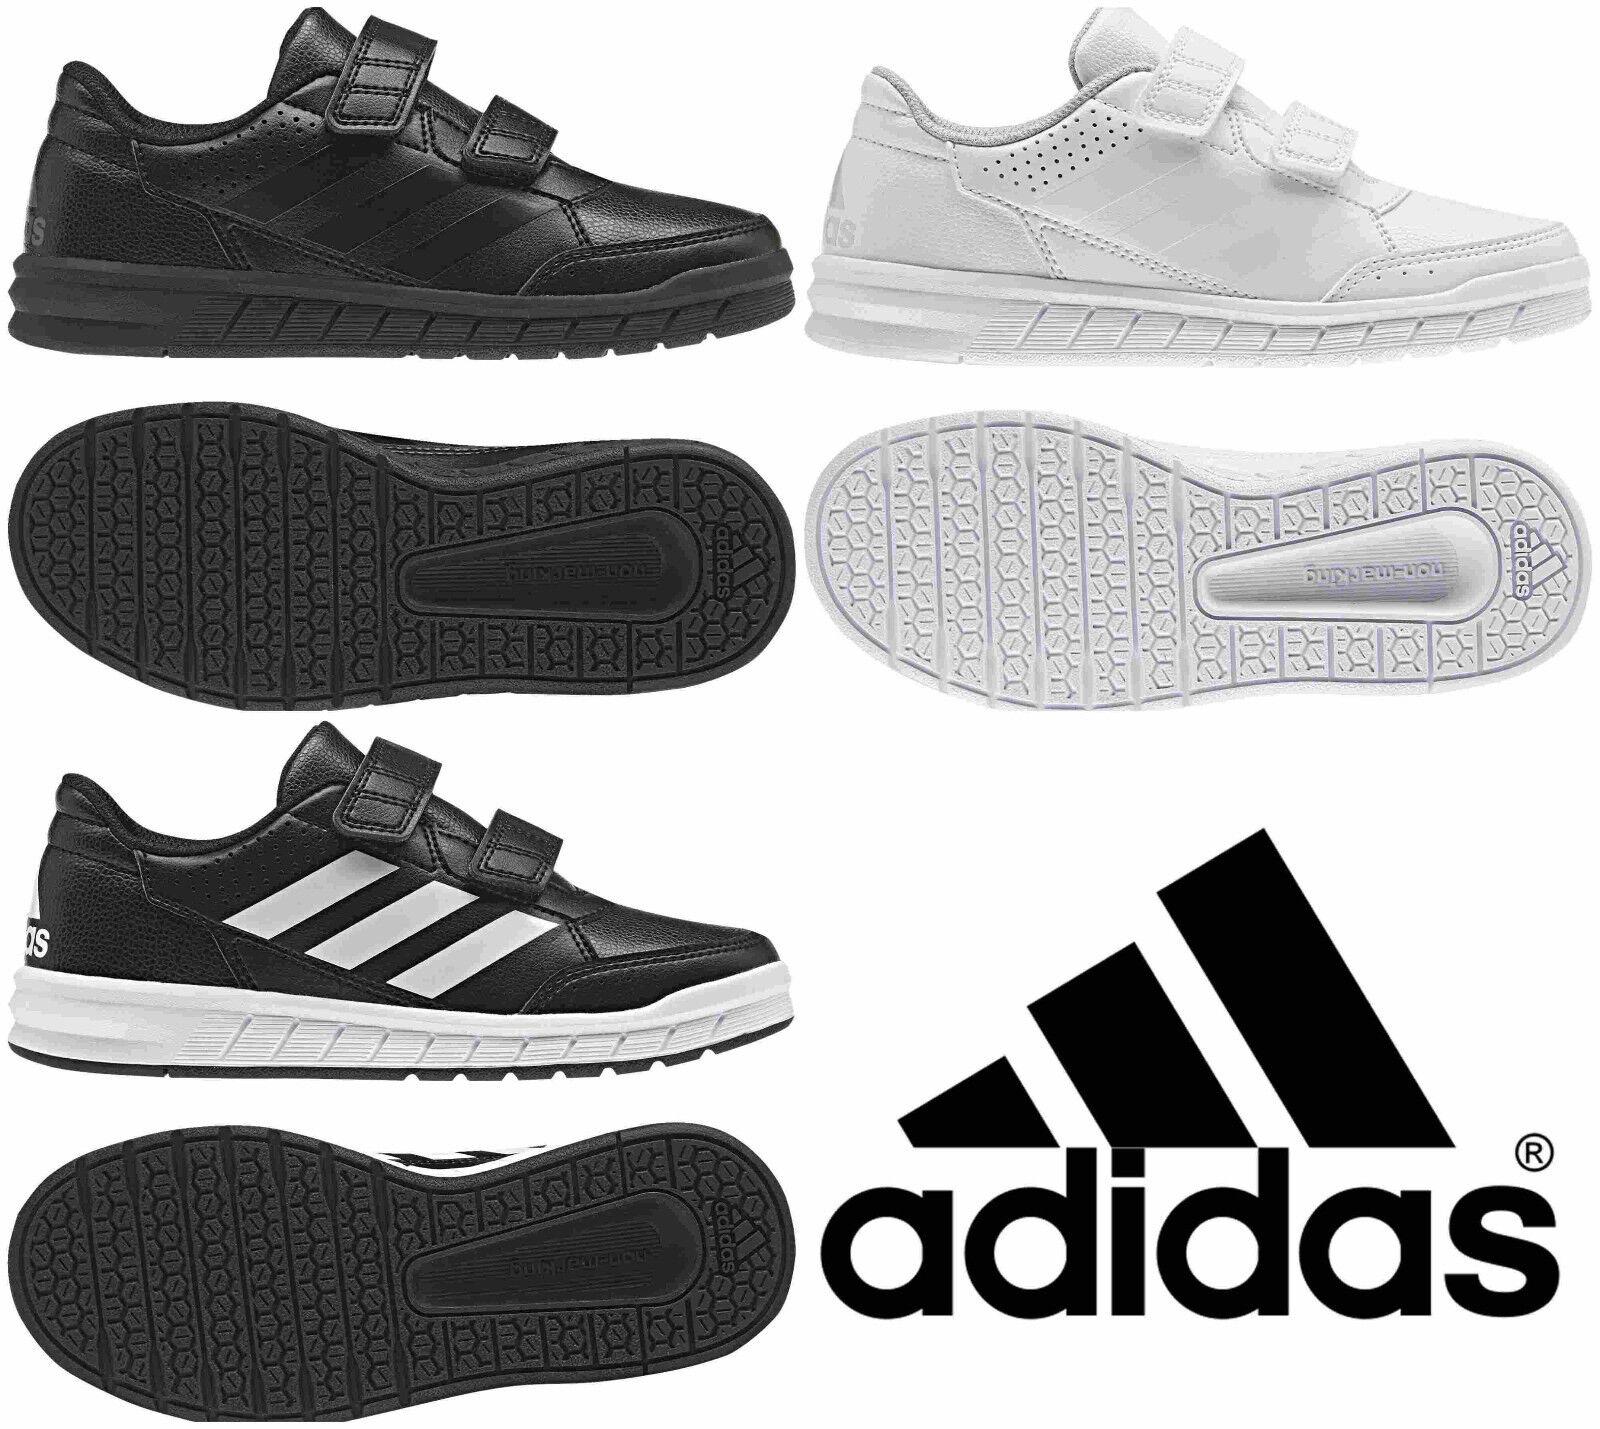 Adidas Boys Shoes Kids Altasport School Casual Running Train